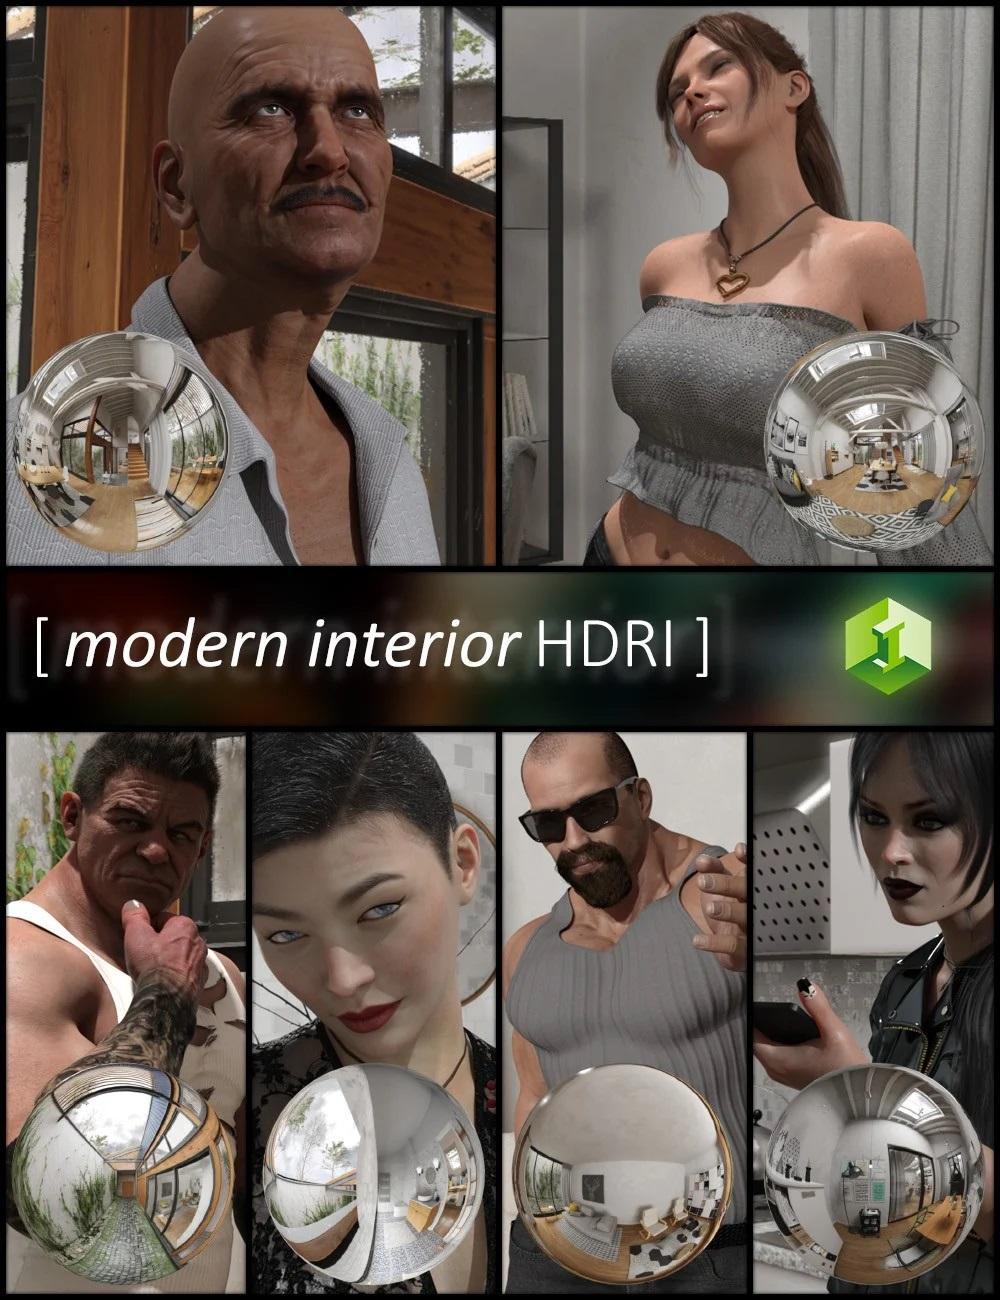 Modern Interiors HDRI